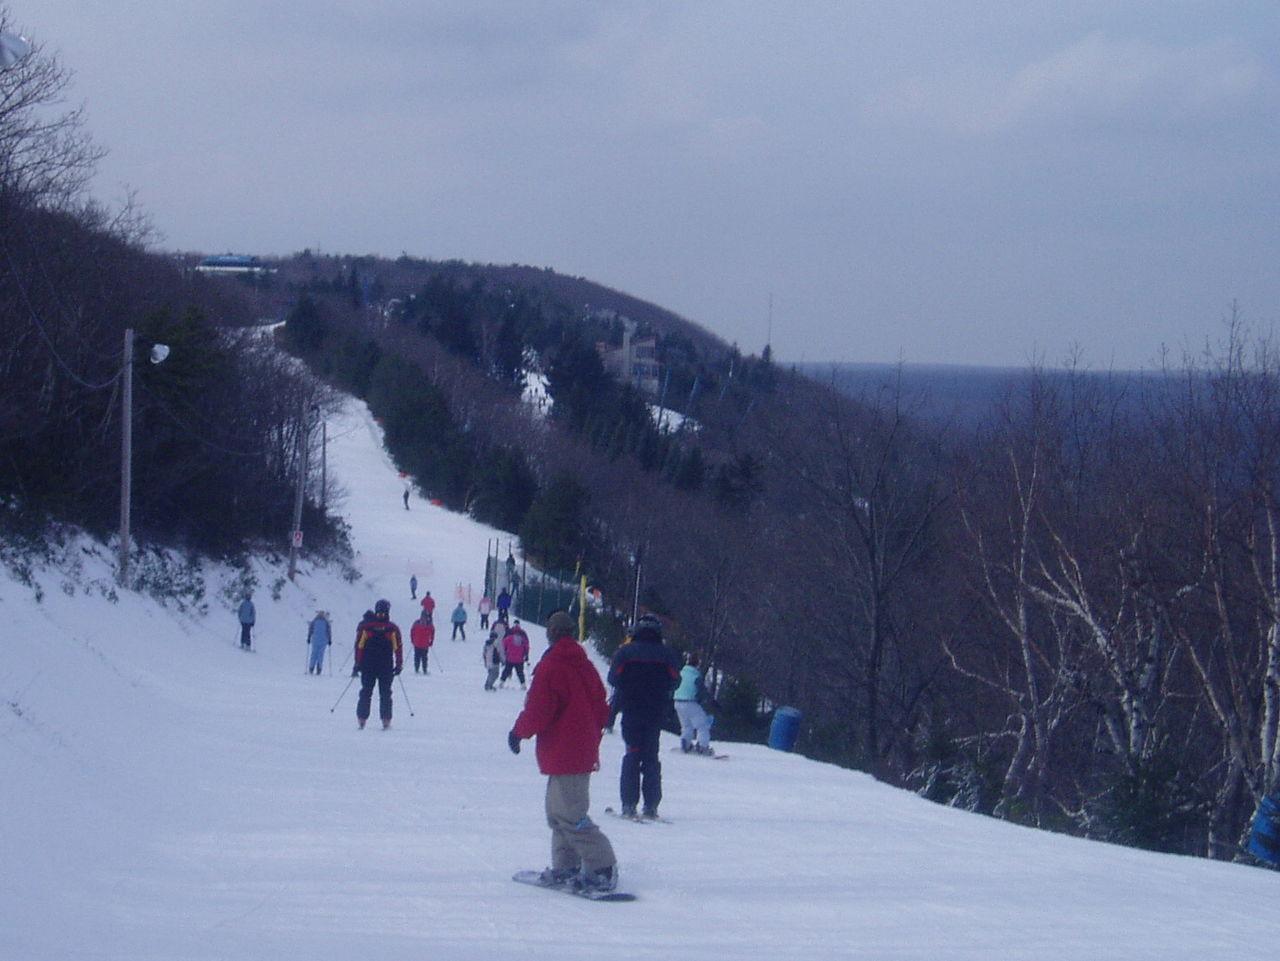 Amazing Ski-resort to visit in Pennsylvania-Camelback Mountain Resort